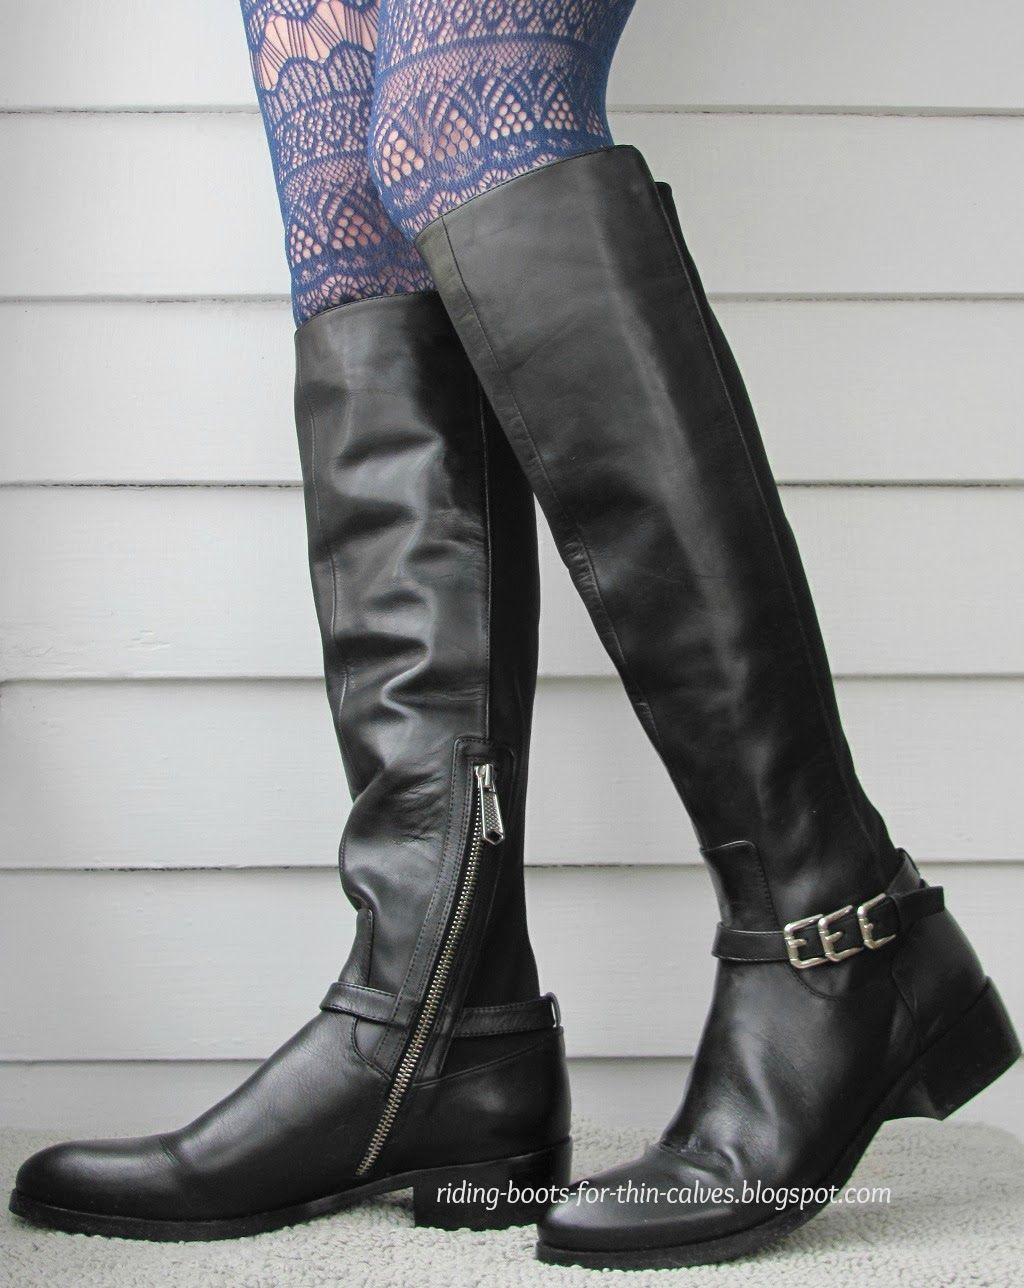 7978ce539ec Howdy slim riding boots for thin calves donald pliner nellie jpg 1024x1288 Skinny  calves